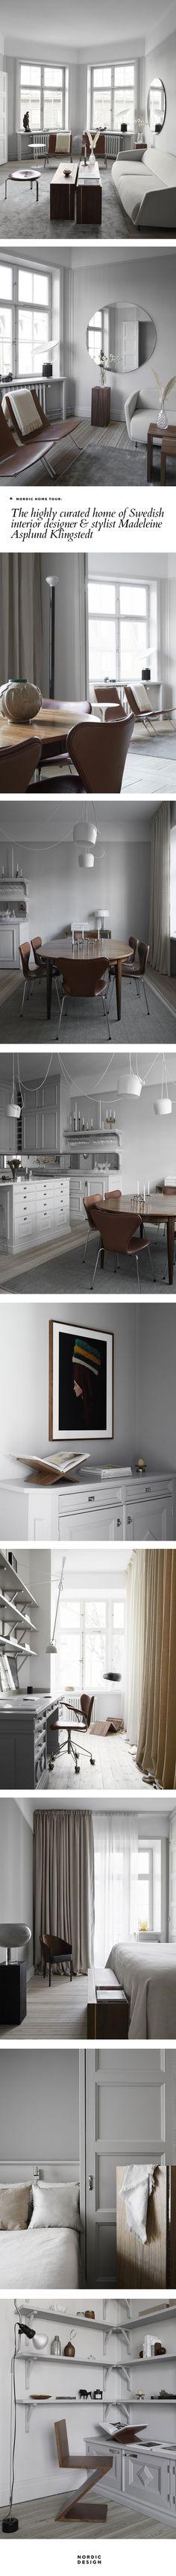 The highly curated home of Swedish interior designer & stylist Madeleine Asplund Kingstedt Nordic Interior, Kitchen Interior, Interior Design, Swedish Interiors, Rustic Interiors, Living Room Designs, Living Spaces, Nordic Living Room, Scandinavian Home